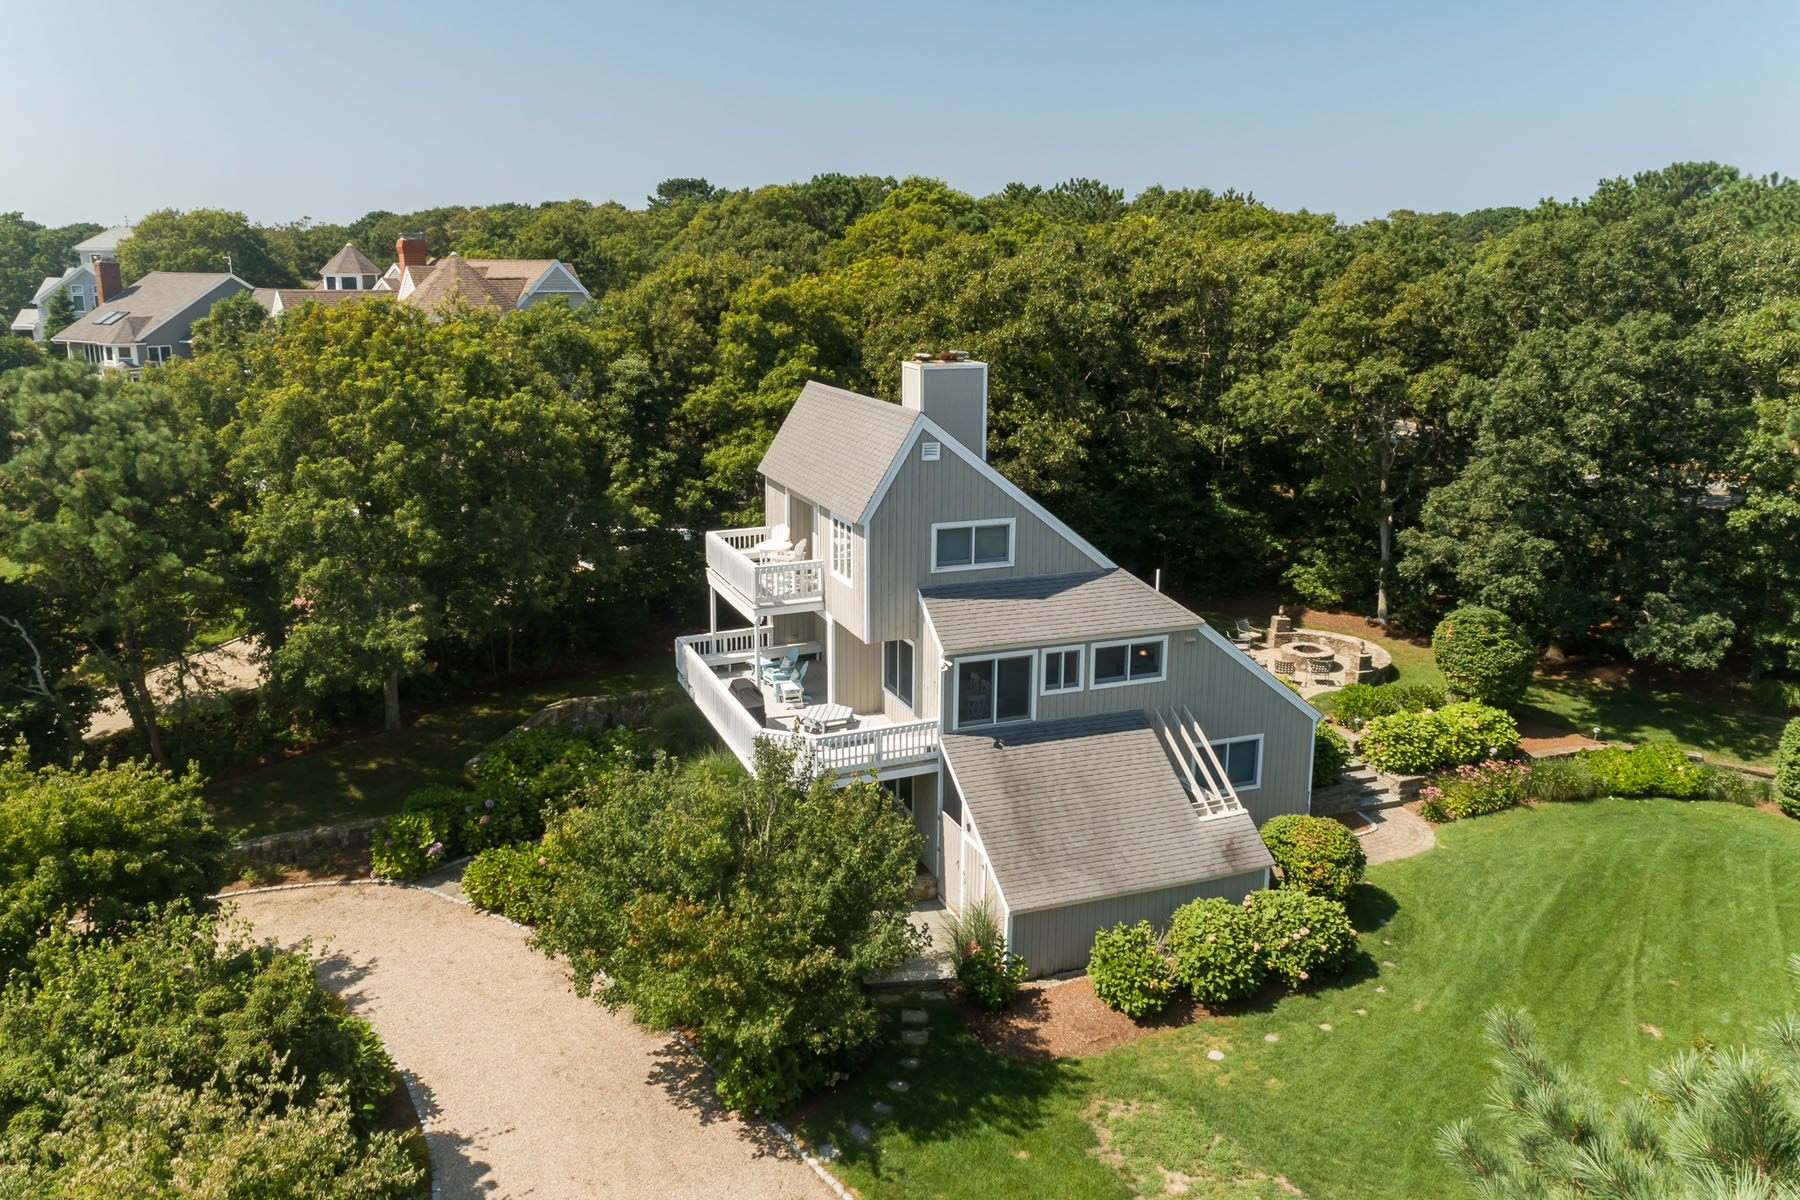 Single Family Homes for Sale at FABULOUS BEACH HOUSE! 21 Triton Way New Seabury, Massachusetts 02649 United States